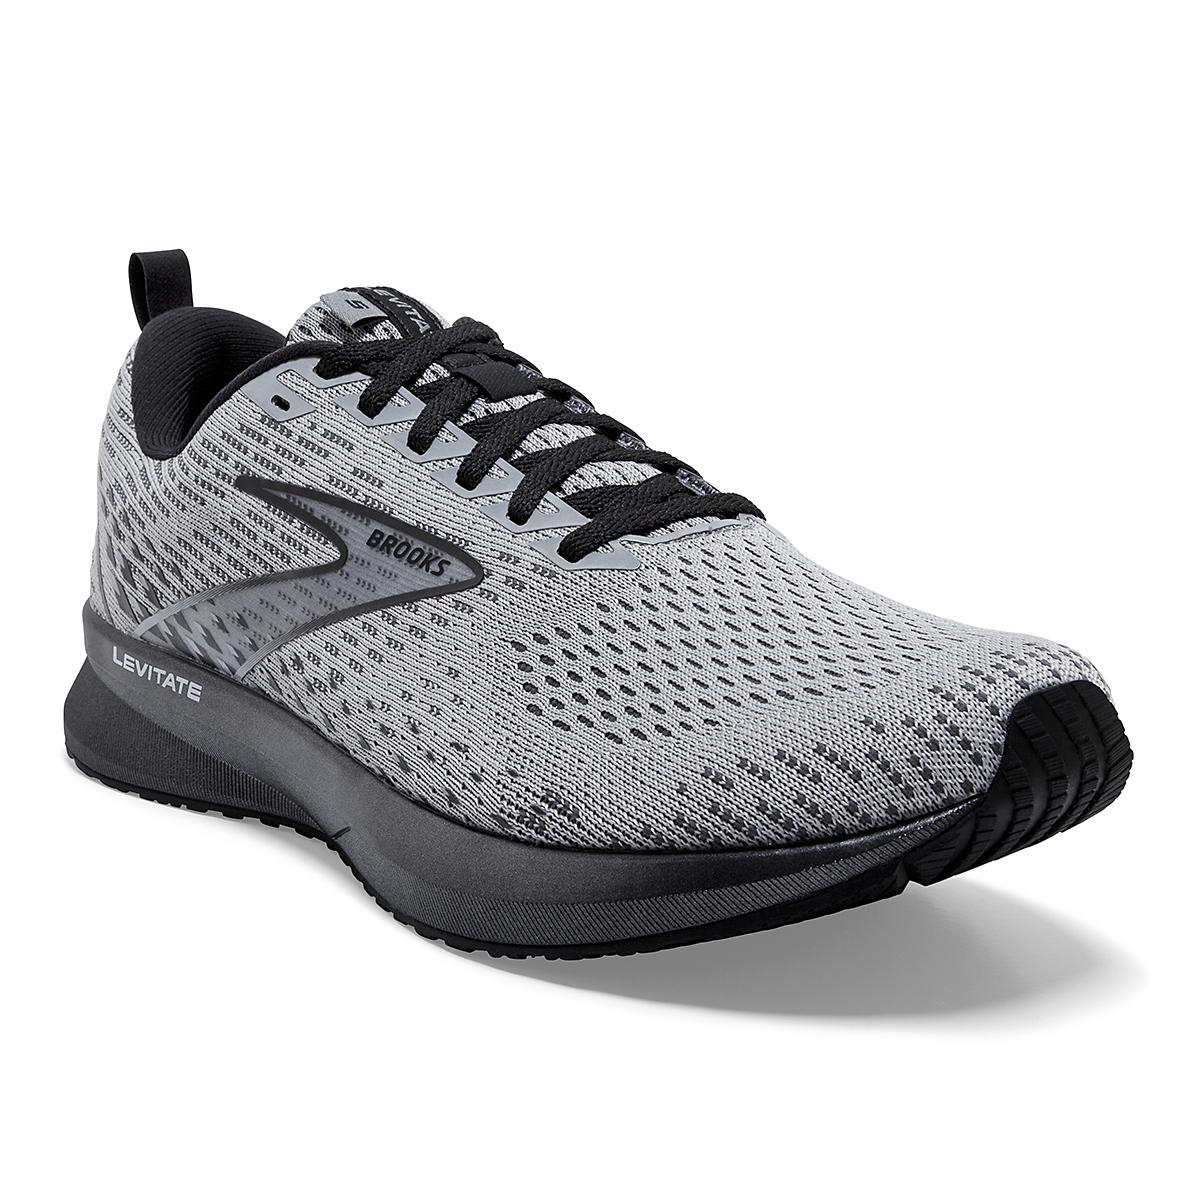 Men's Brooks Levitate 5 Running Shoe - Color: Grey/Blackened - Size: 7 - Width: Regular, Grey/Blackened, large, image 5